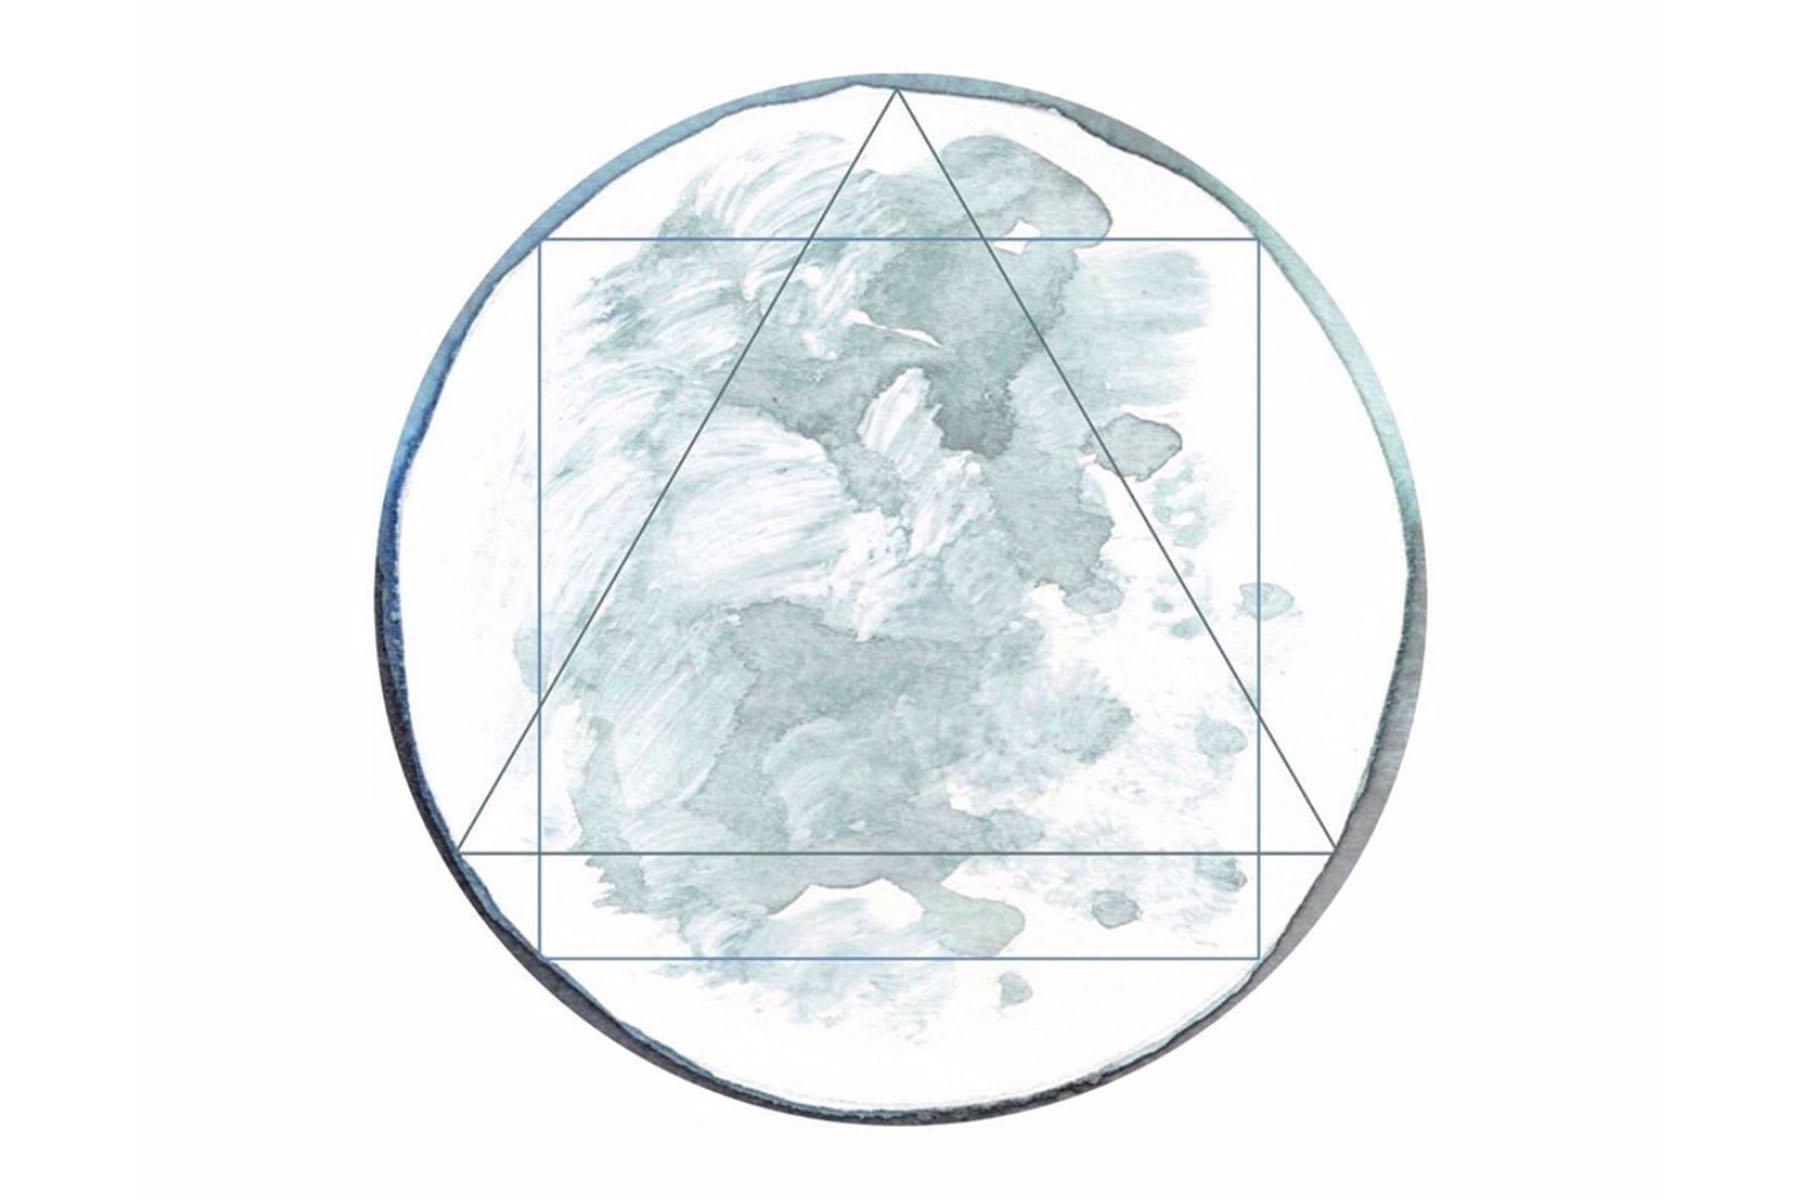 Weekly Horoscope: May 11 – May 17, 2020